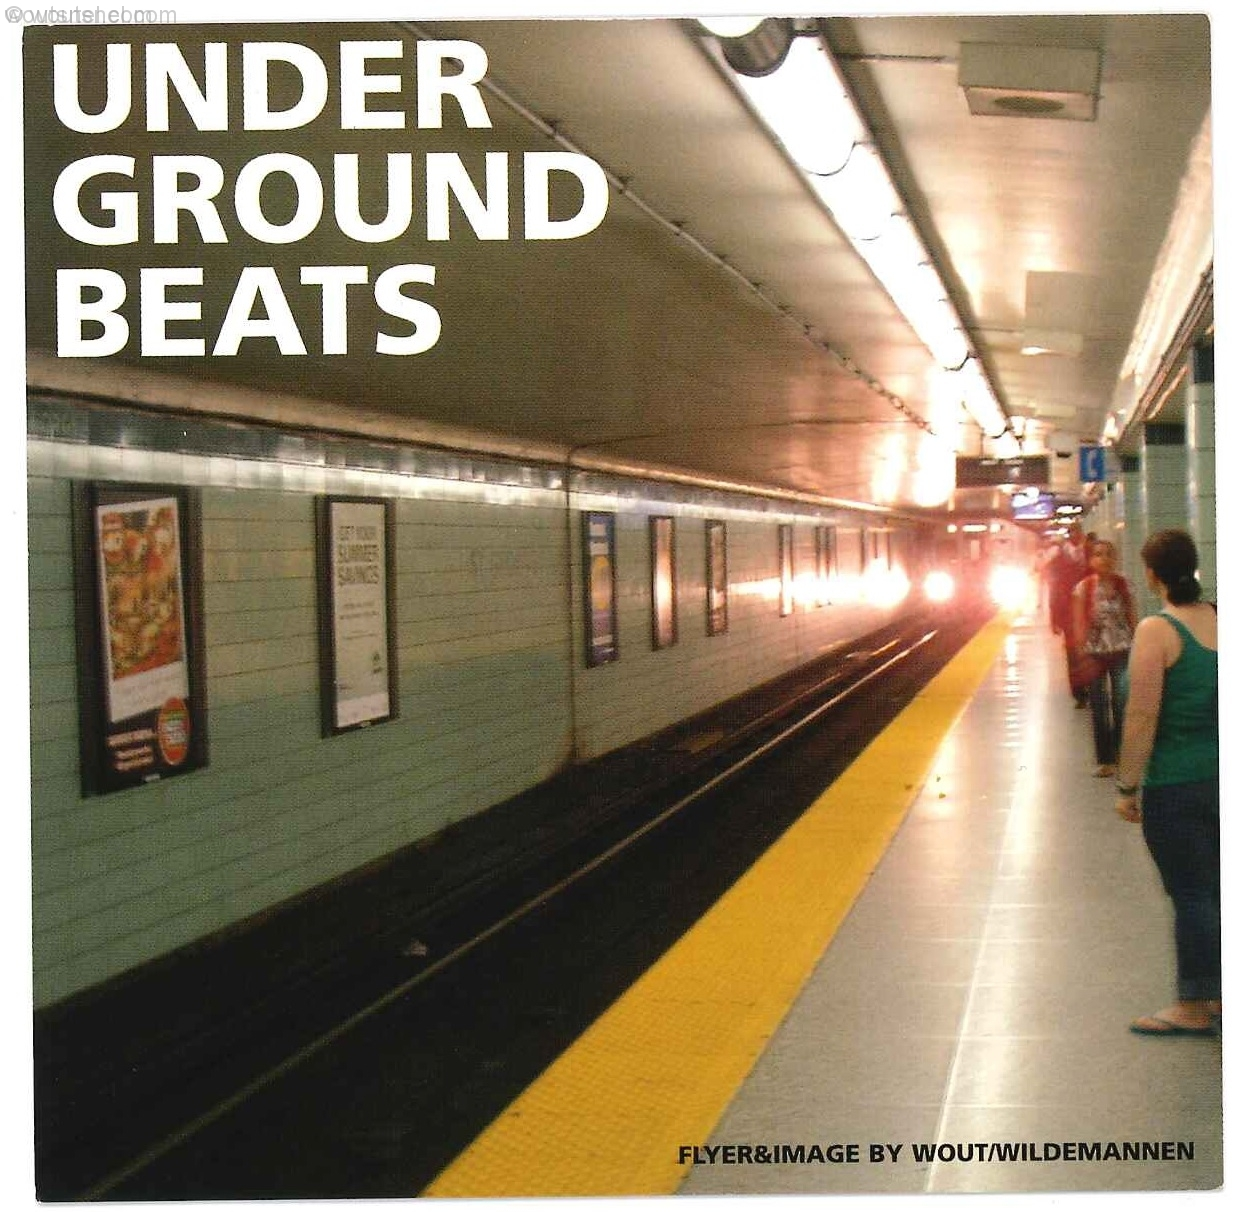 Underground Beats 15 September 2007